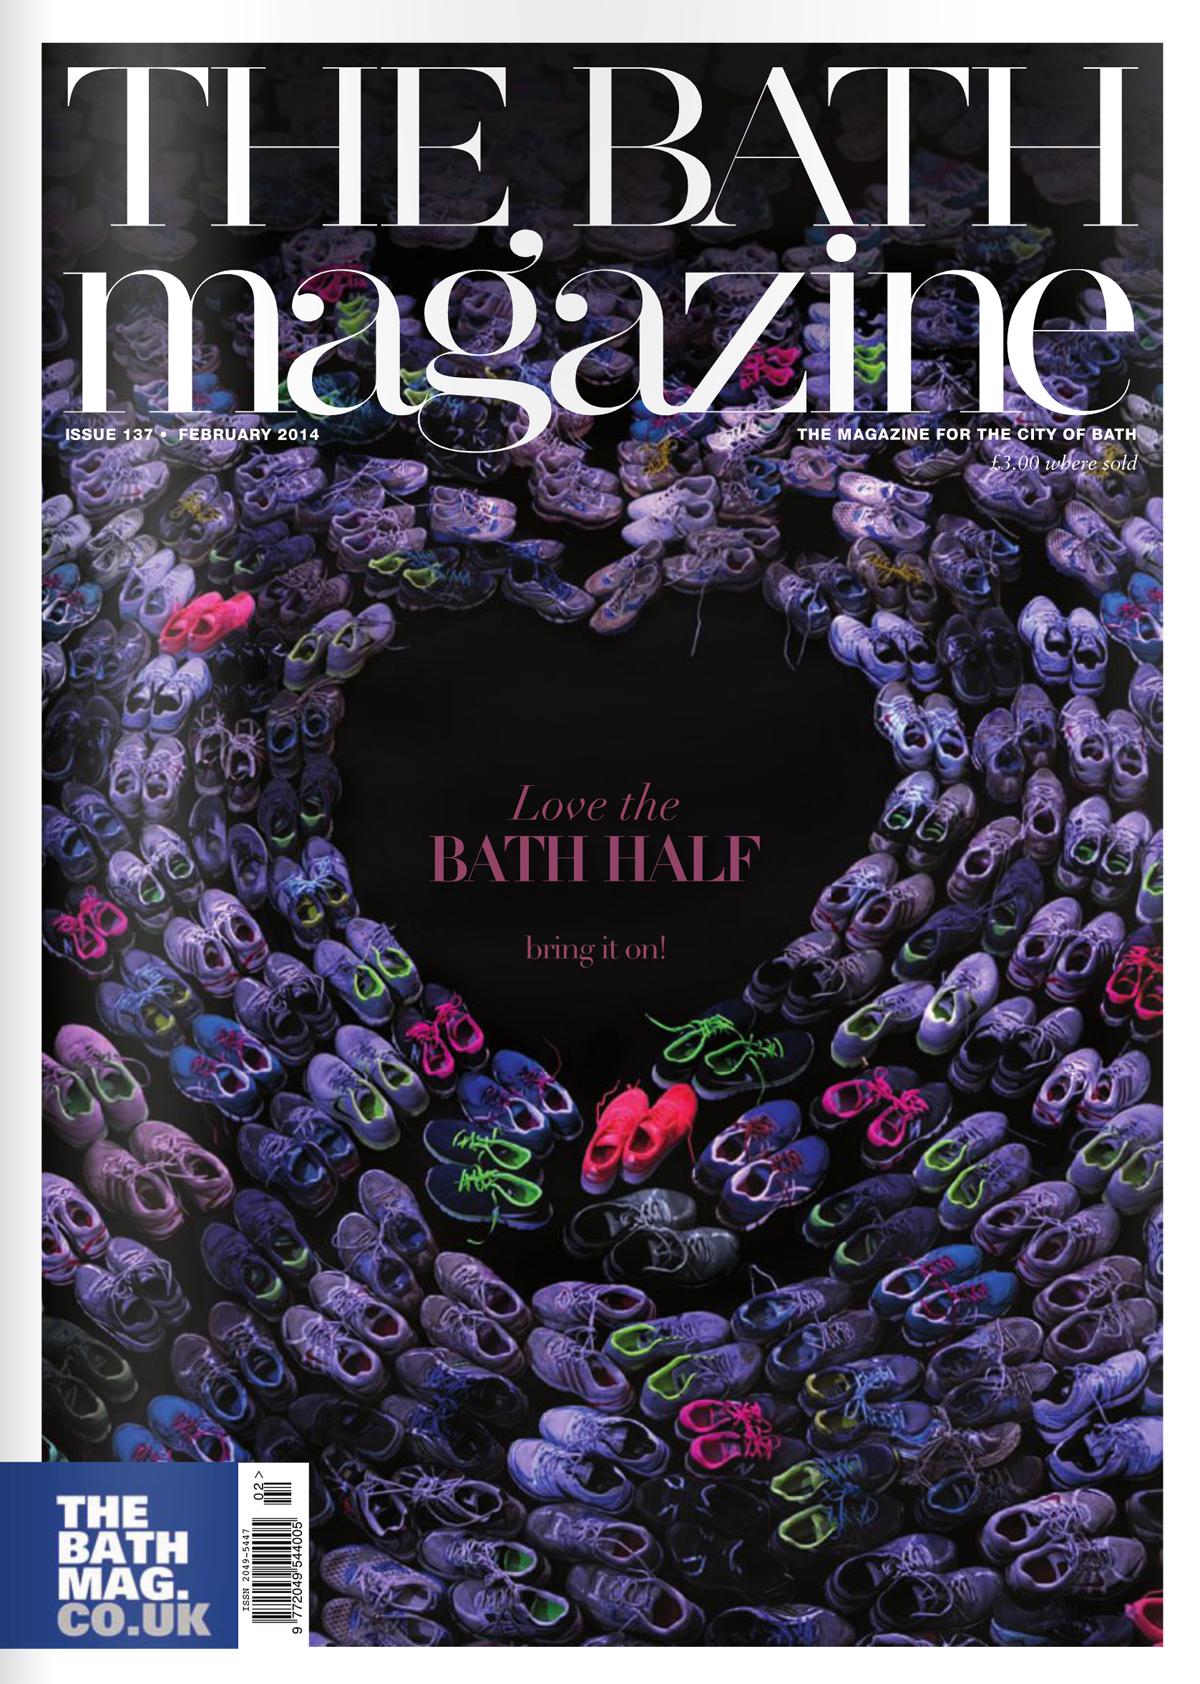 Image via Bath magazine